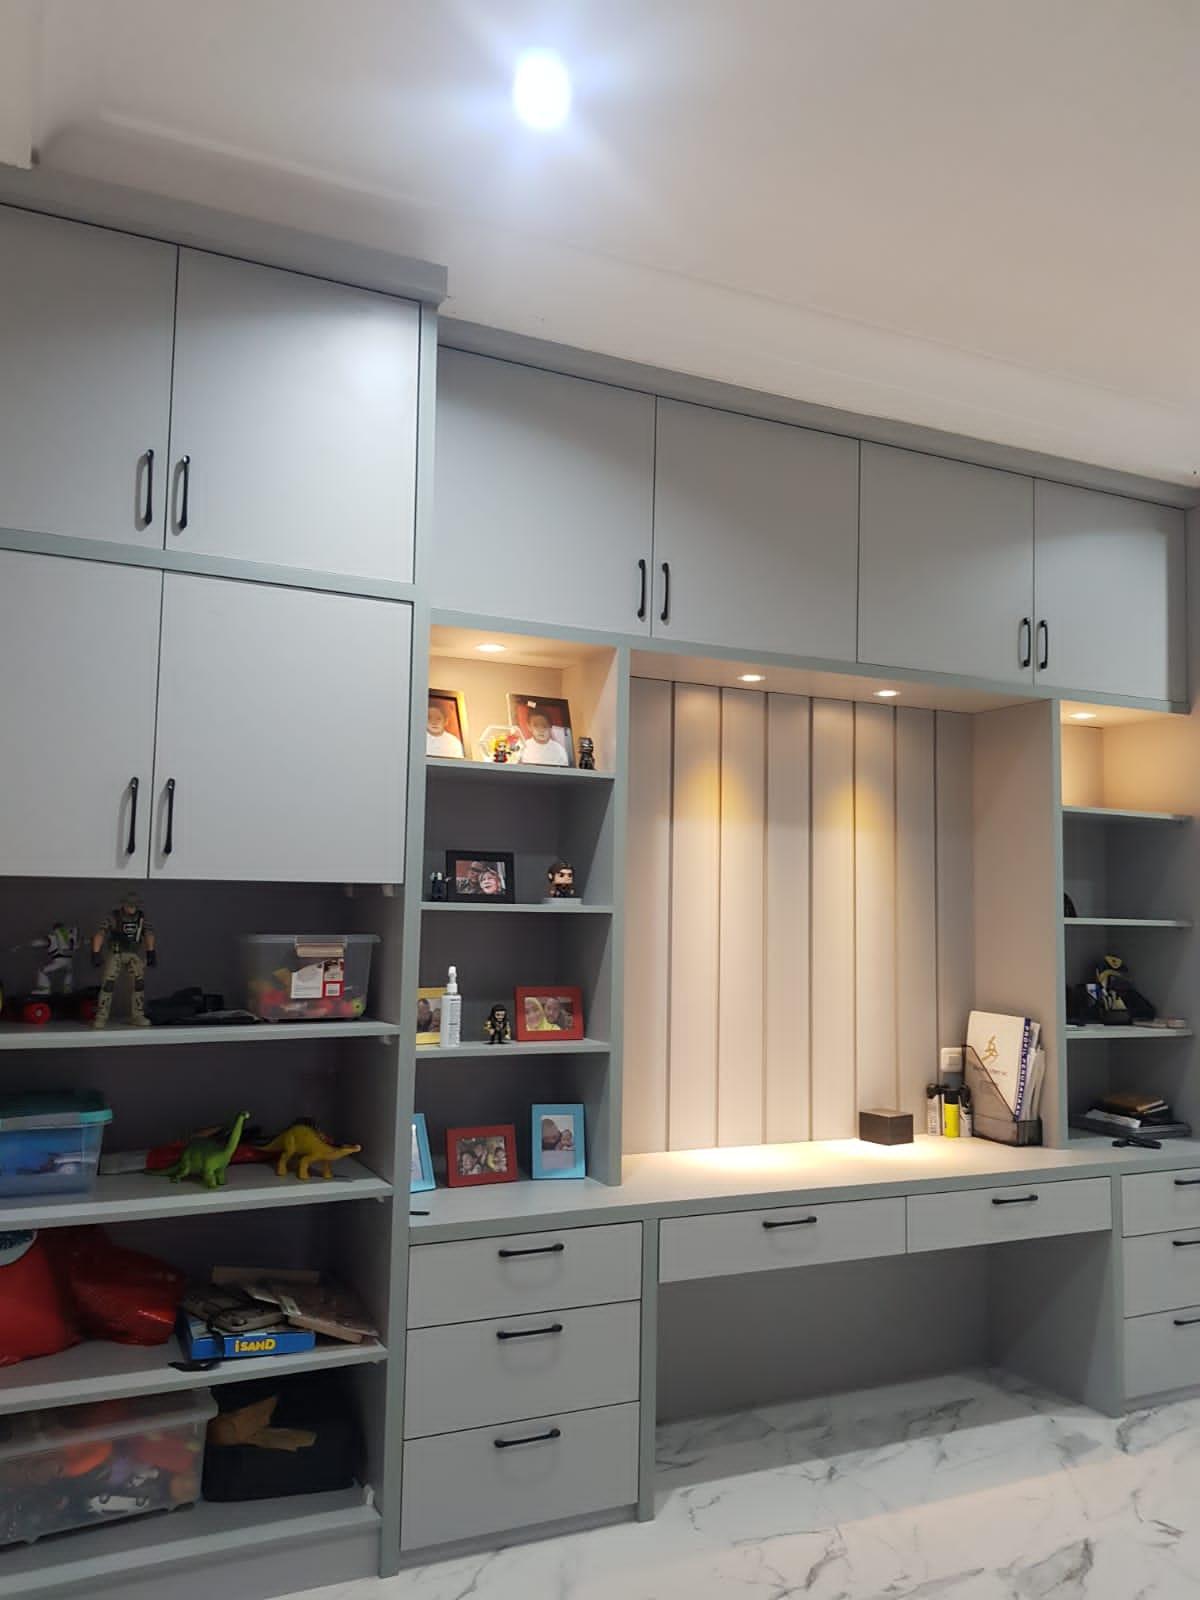 Project Belia Kitchen Set - Lemari Serbaguna - Pondok Indah - Ibu Tyaimage00006